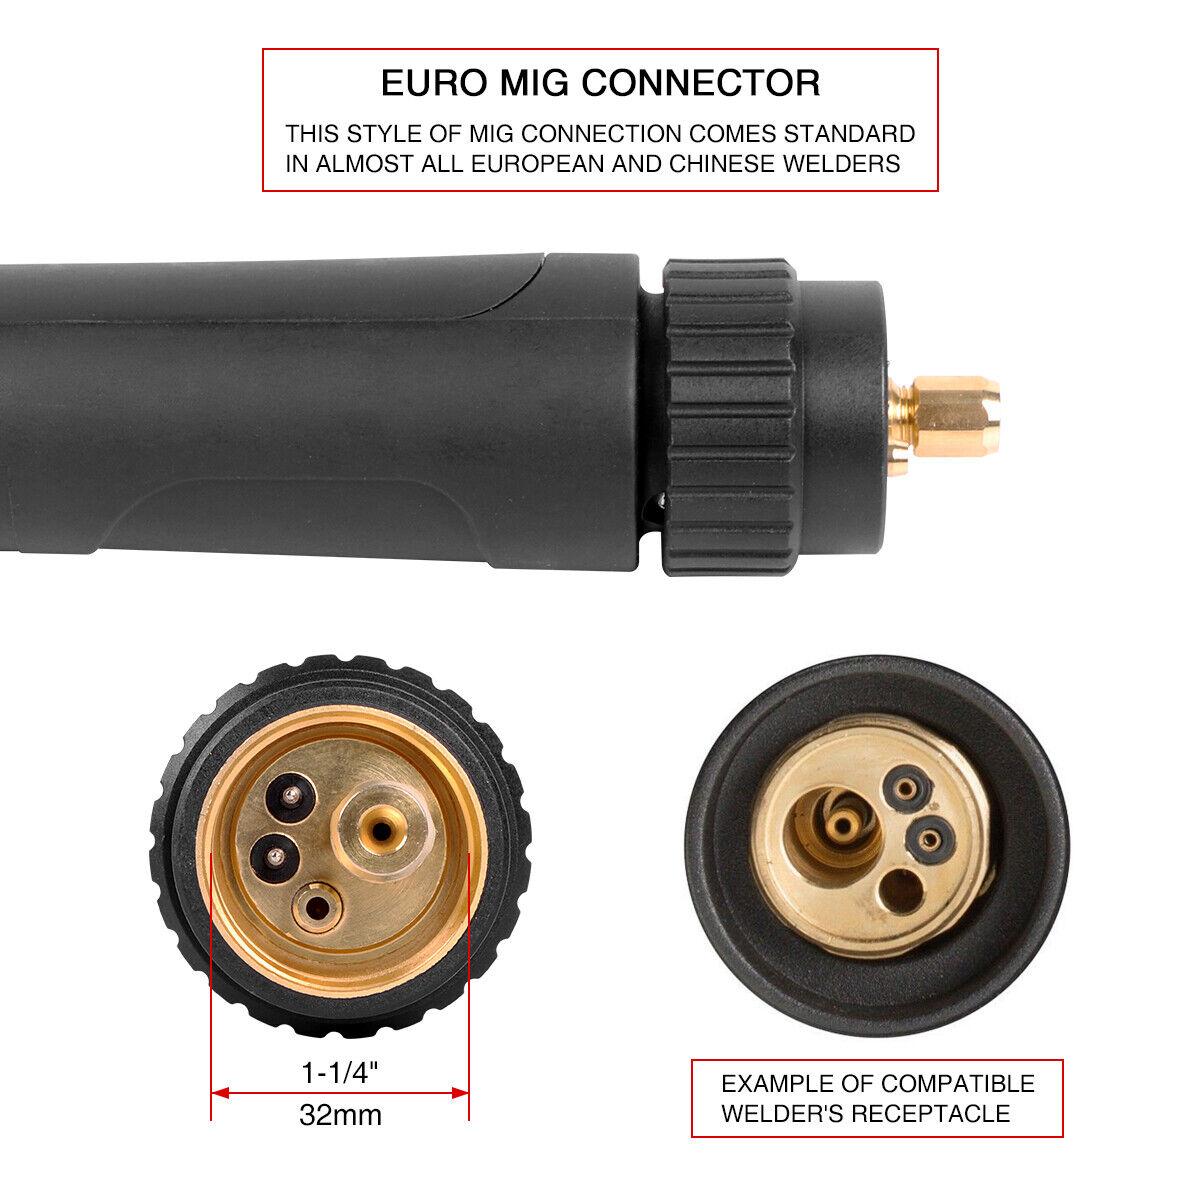 Heavy Duty Mig Welding Gun Euro connection 250A 15/' fits Longevity Esab Tweco #2